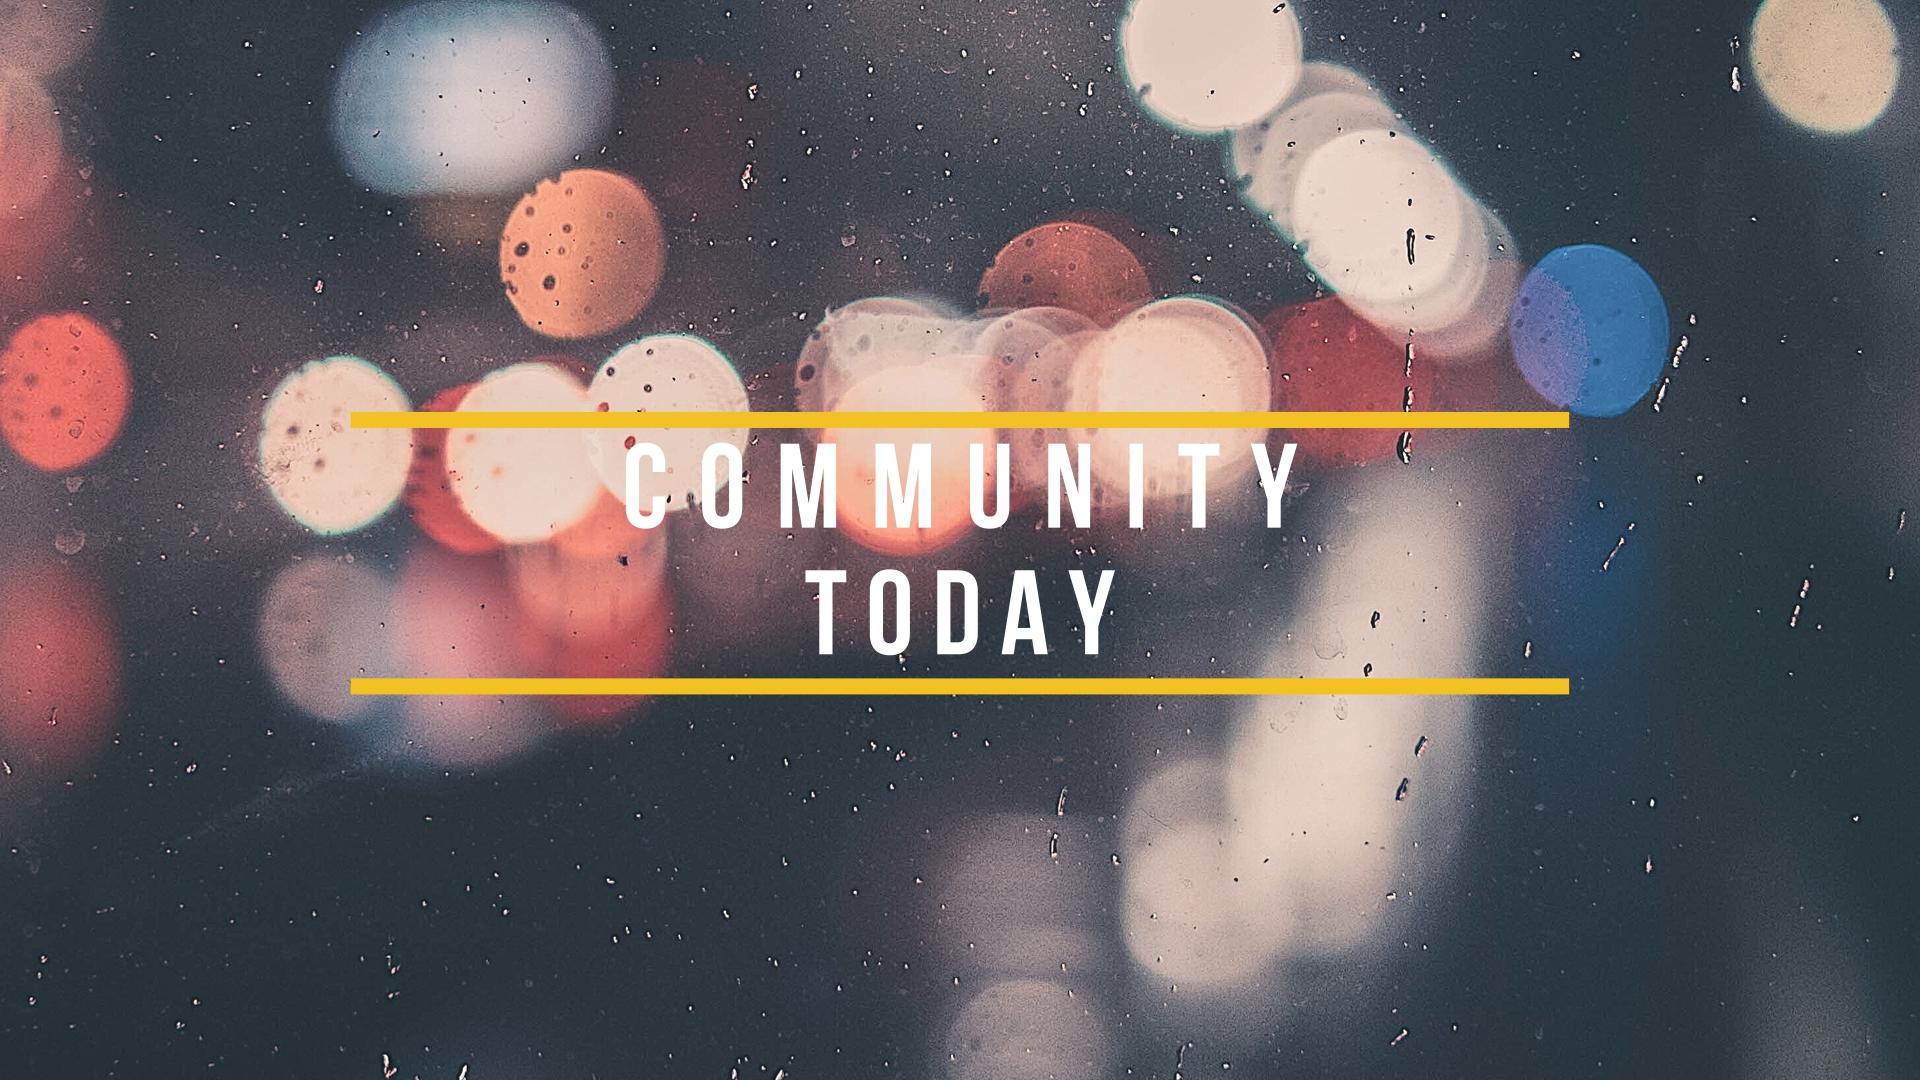 Community_Today.jpg